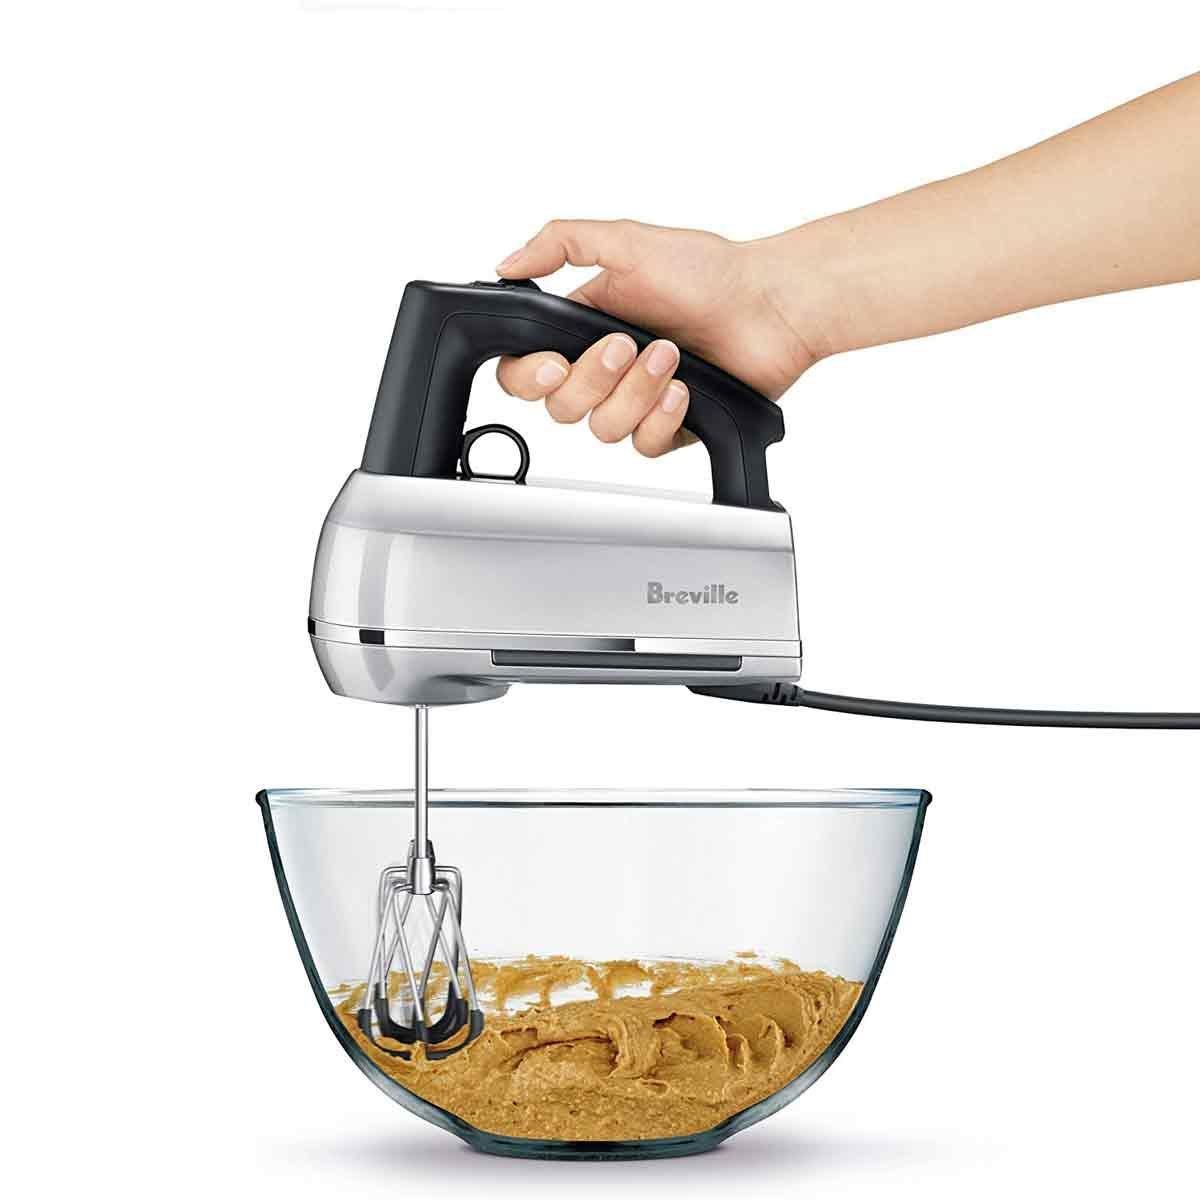 Breville-Hand-Mixer